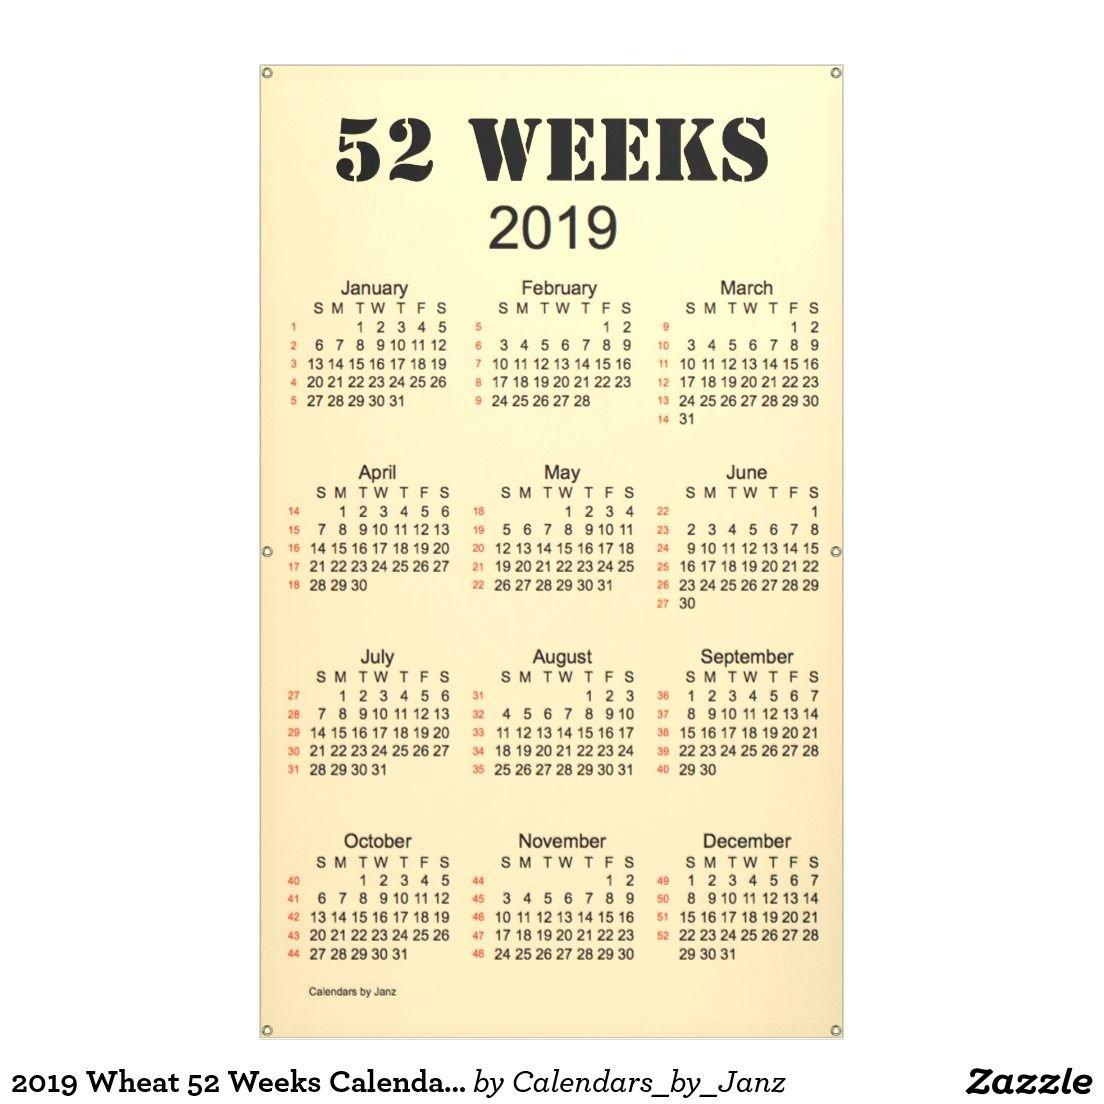 2019 Wheat 52 Weeks Calendarjanz Banner | Wholesale Merchandise 2019 Calendar 52 Weeks